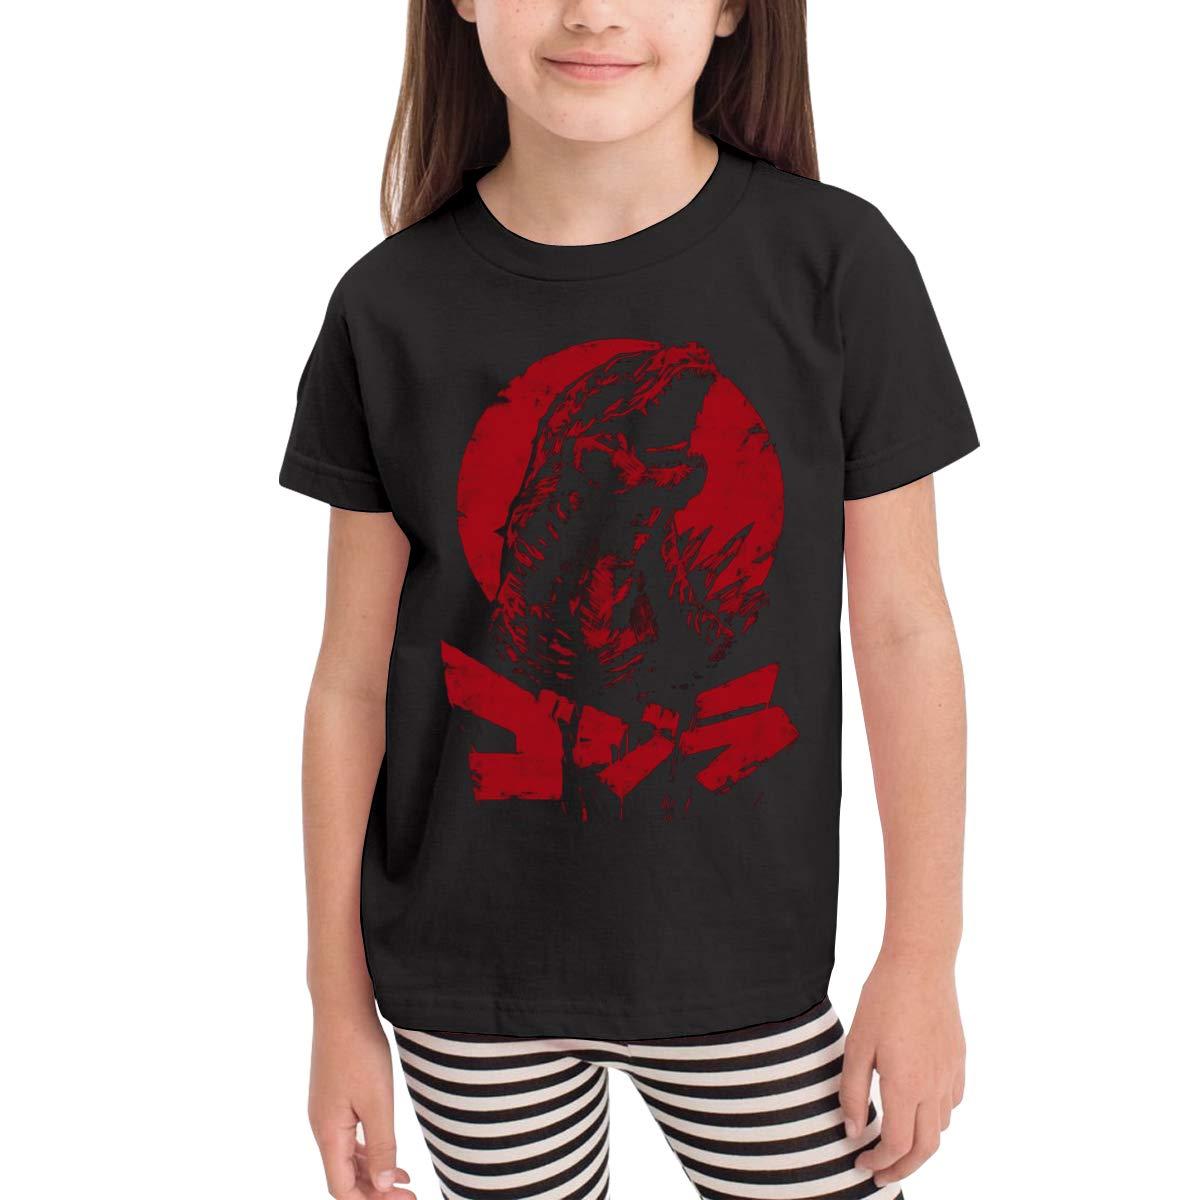 Kaddias The King Will Rise God Zilla Girls Classic Short Sleeve T Shirt 8285